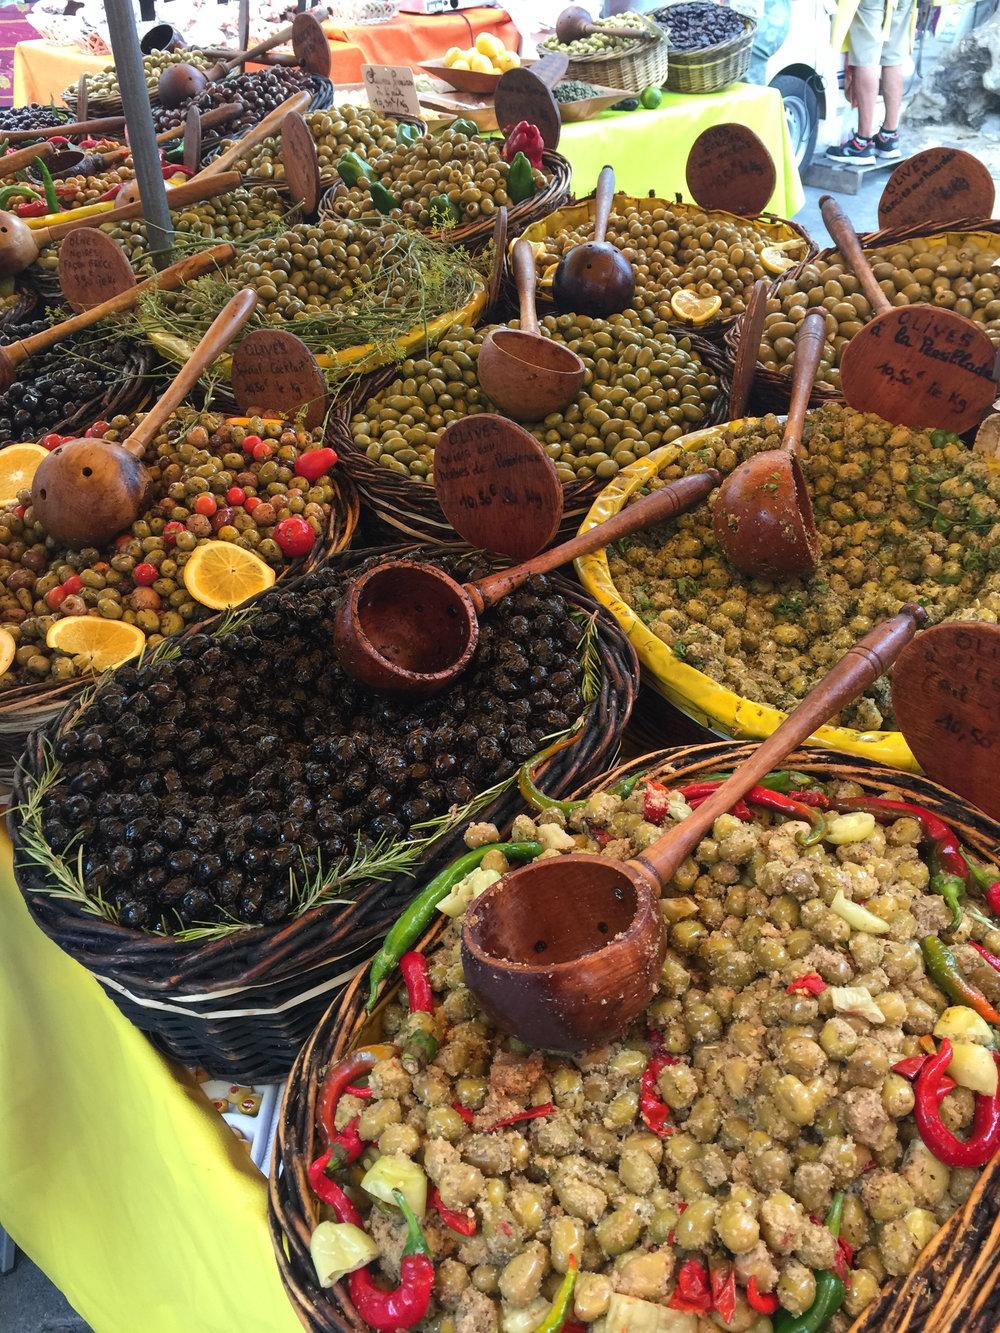 Olives upon olives at a mid-week open market.